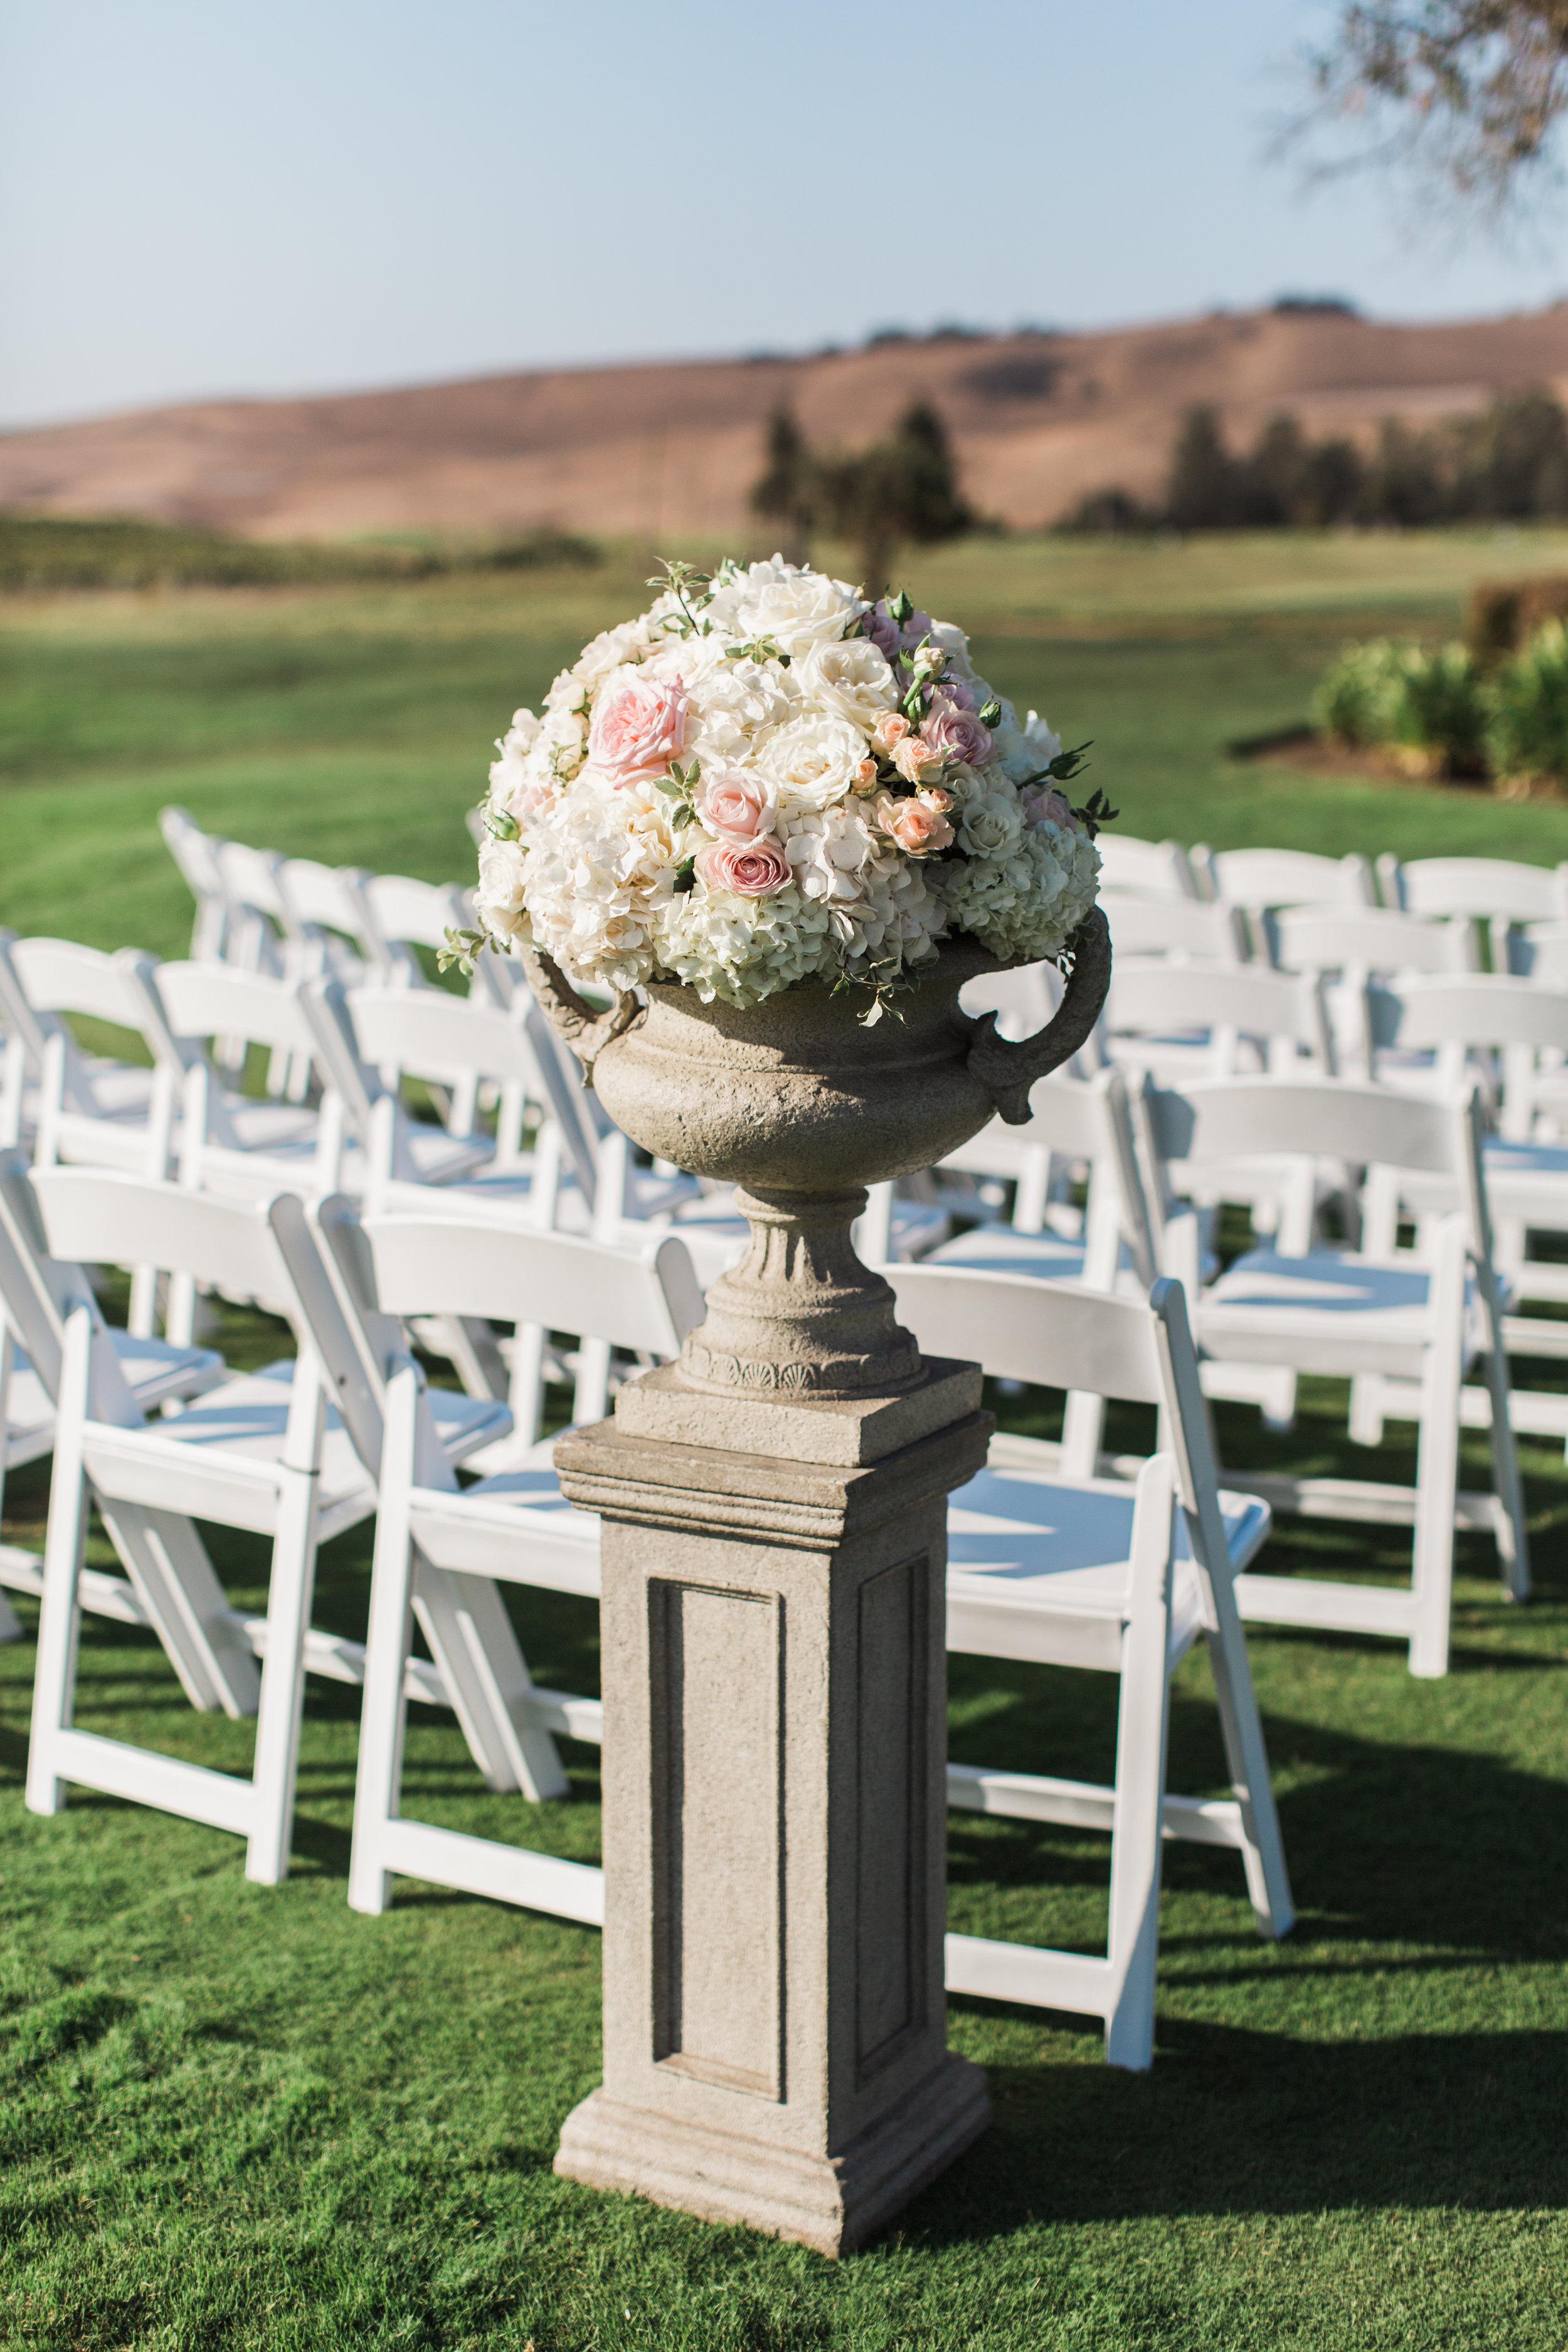 jenny-and-george-wedding-roque-events-meyerott-photography 650.jpg